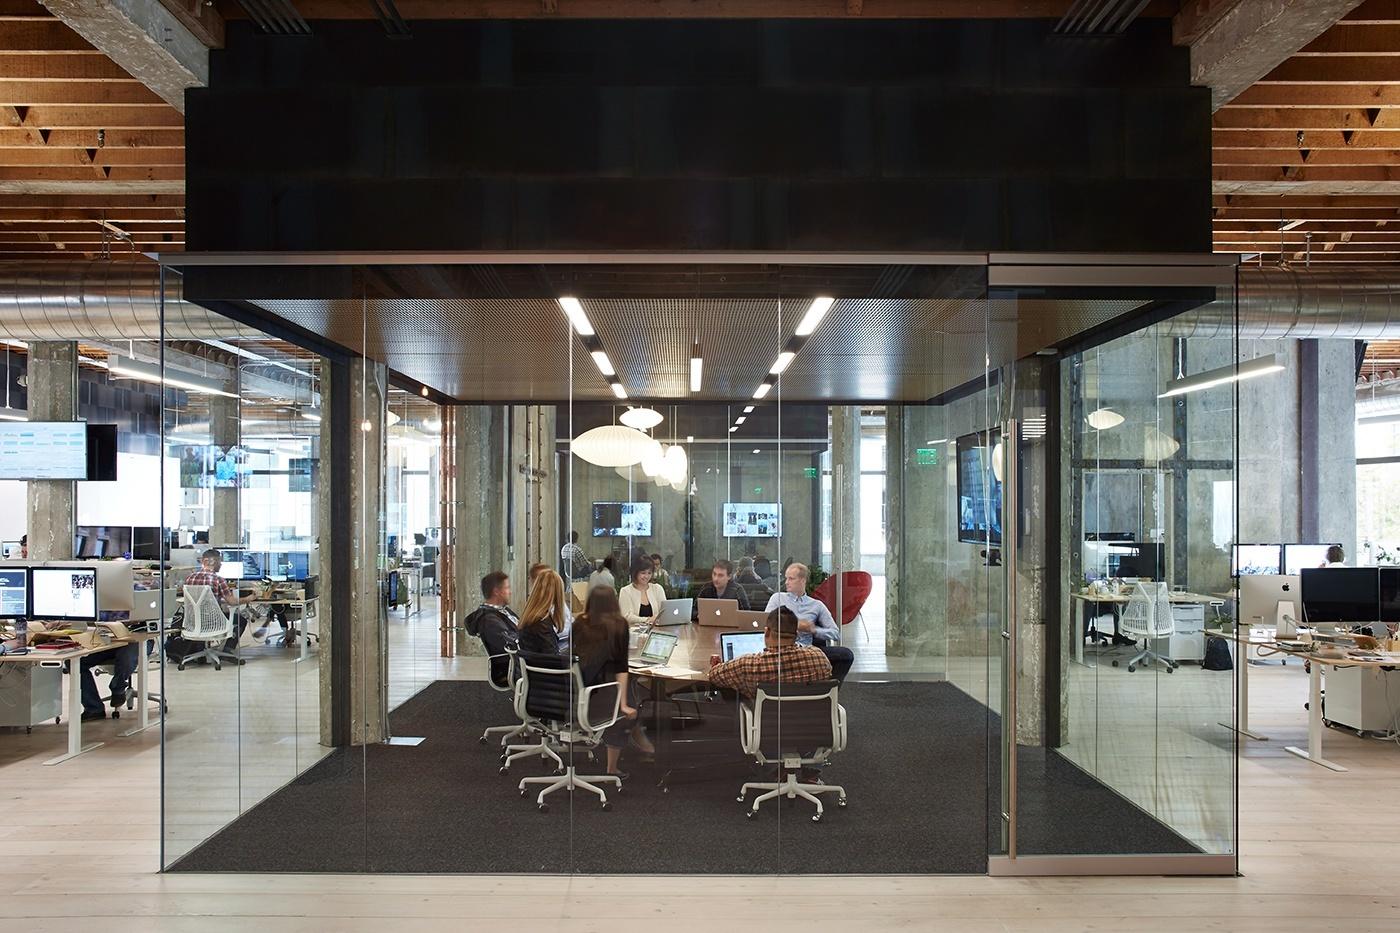 A Look Inside Vsco S Amazing Headquarters In Oakland